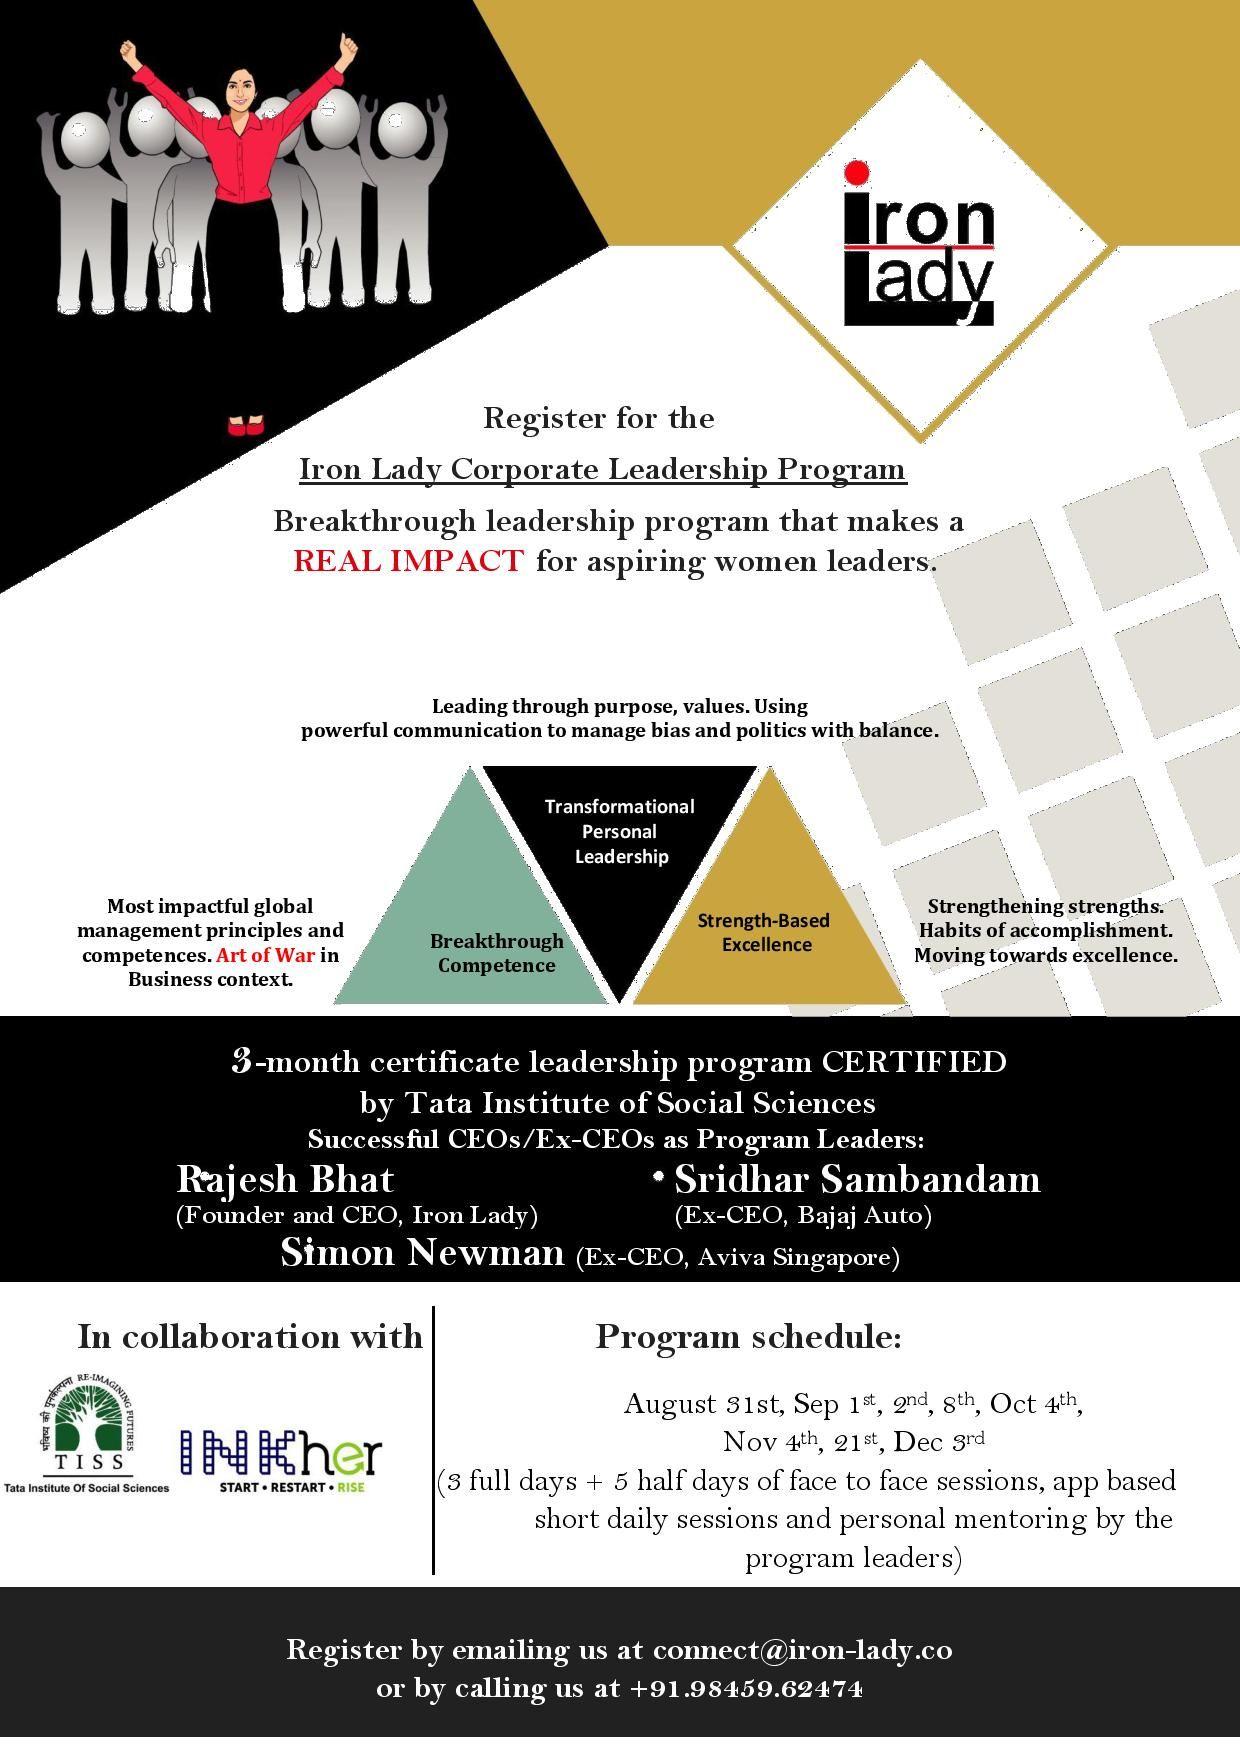 Iron Lady Leadership Program